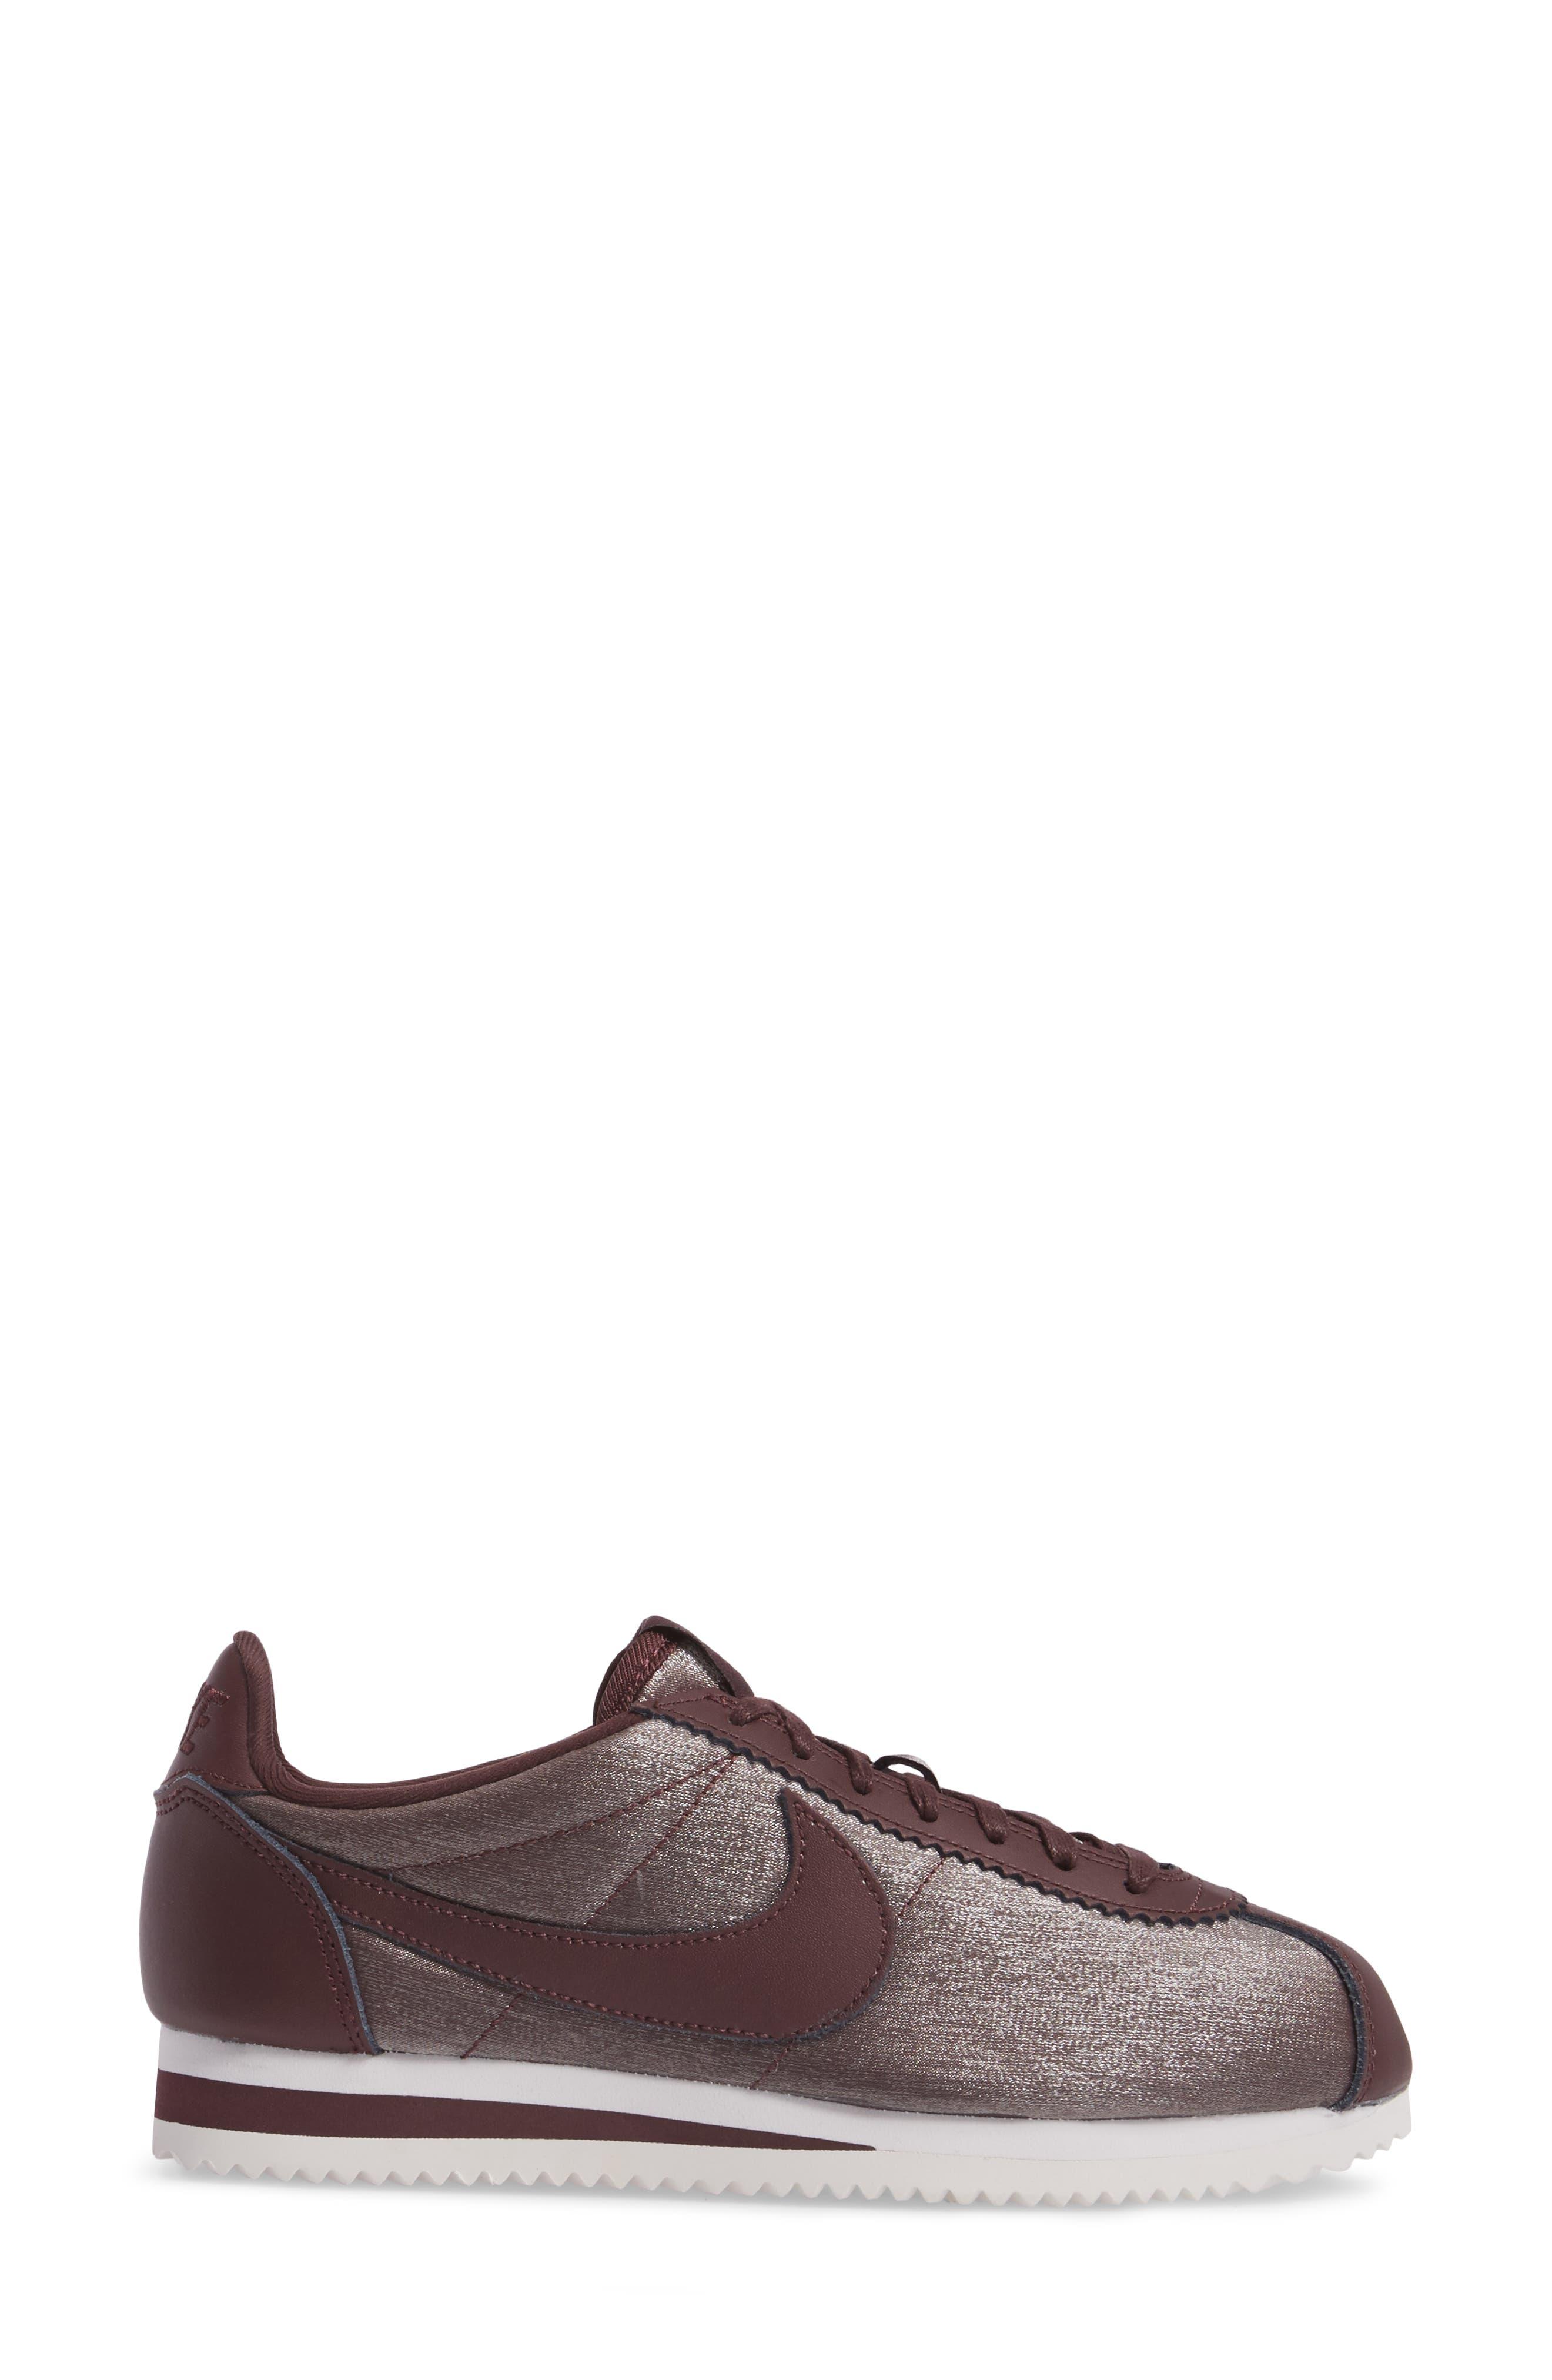 Classic Cortez Premium XLV Sneaker,                             Alternate thumbnail 6, color,                             Mahogany/ Mahogany/ White